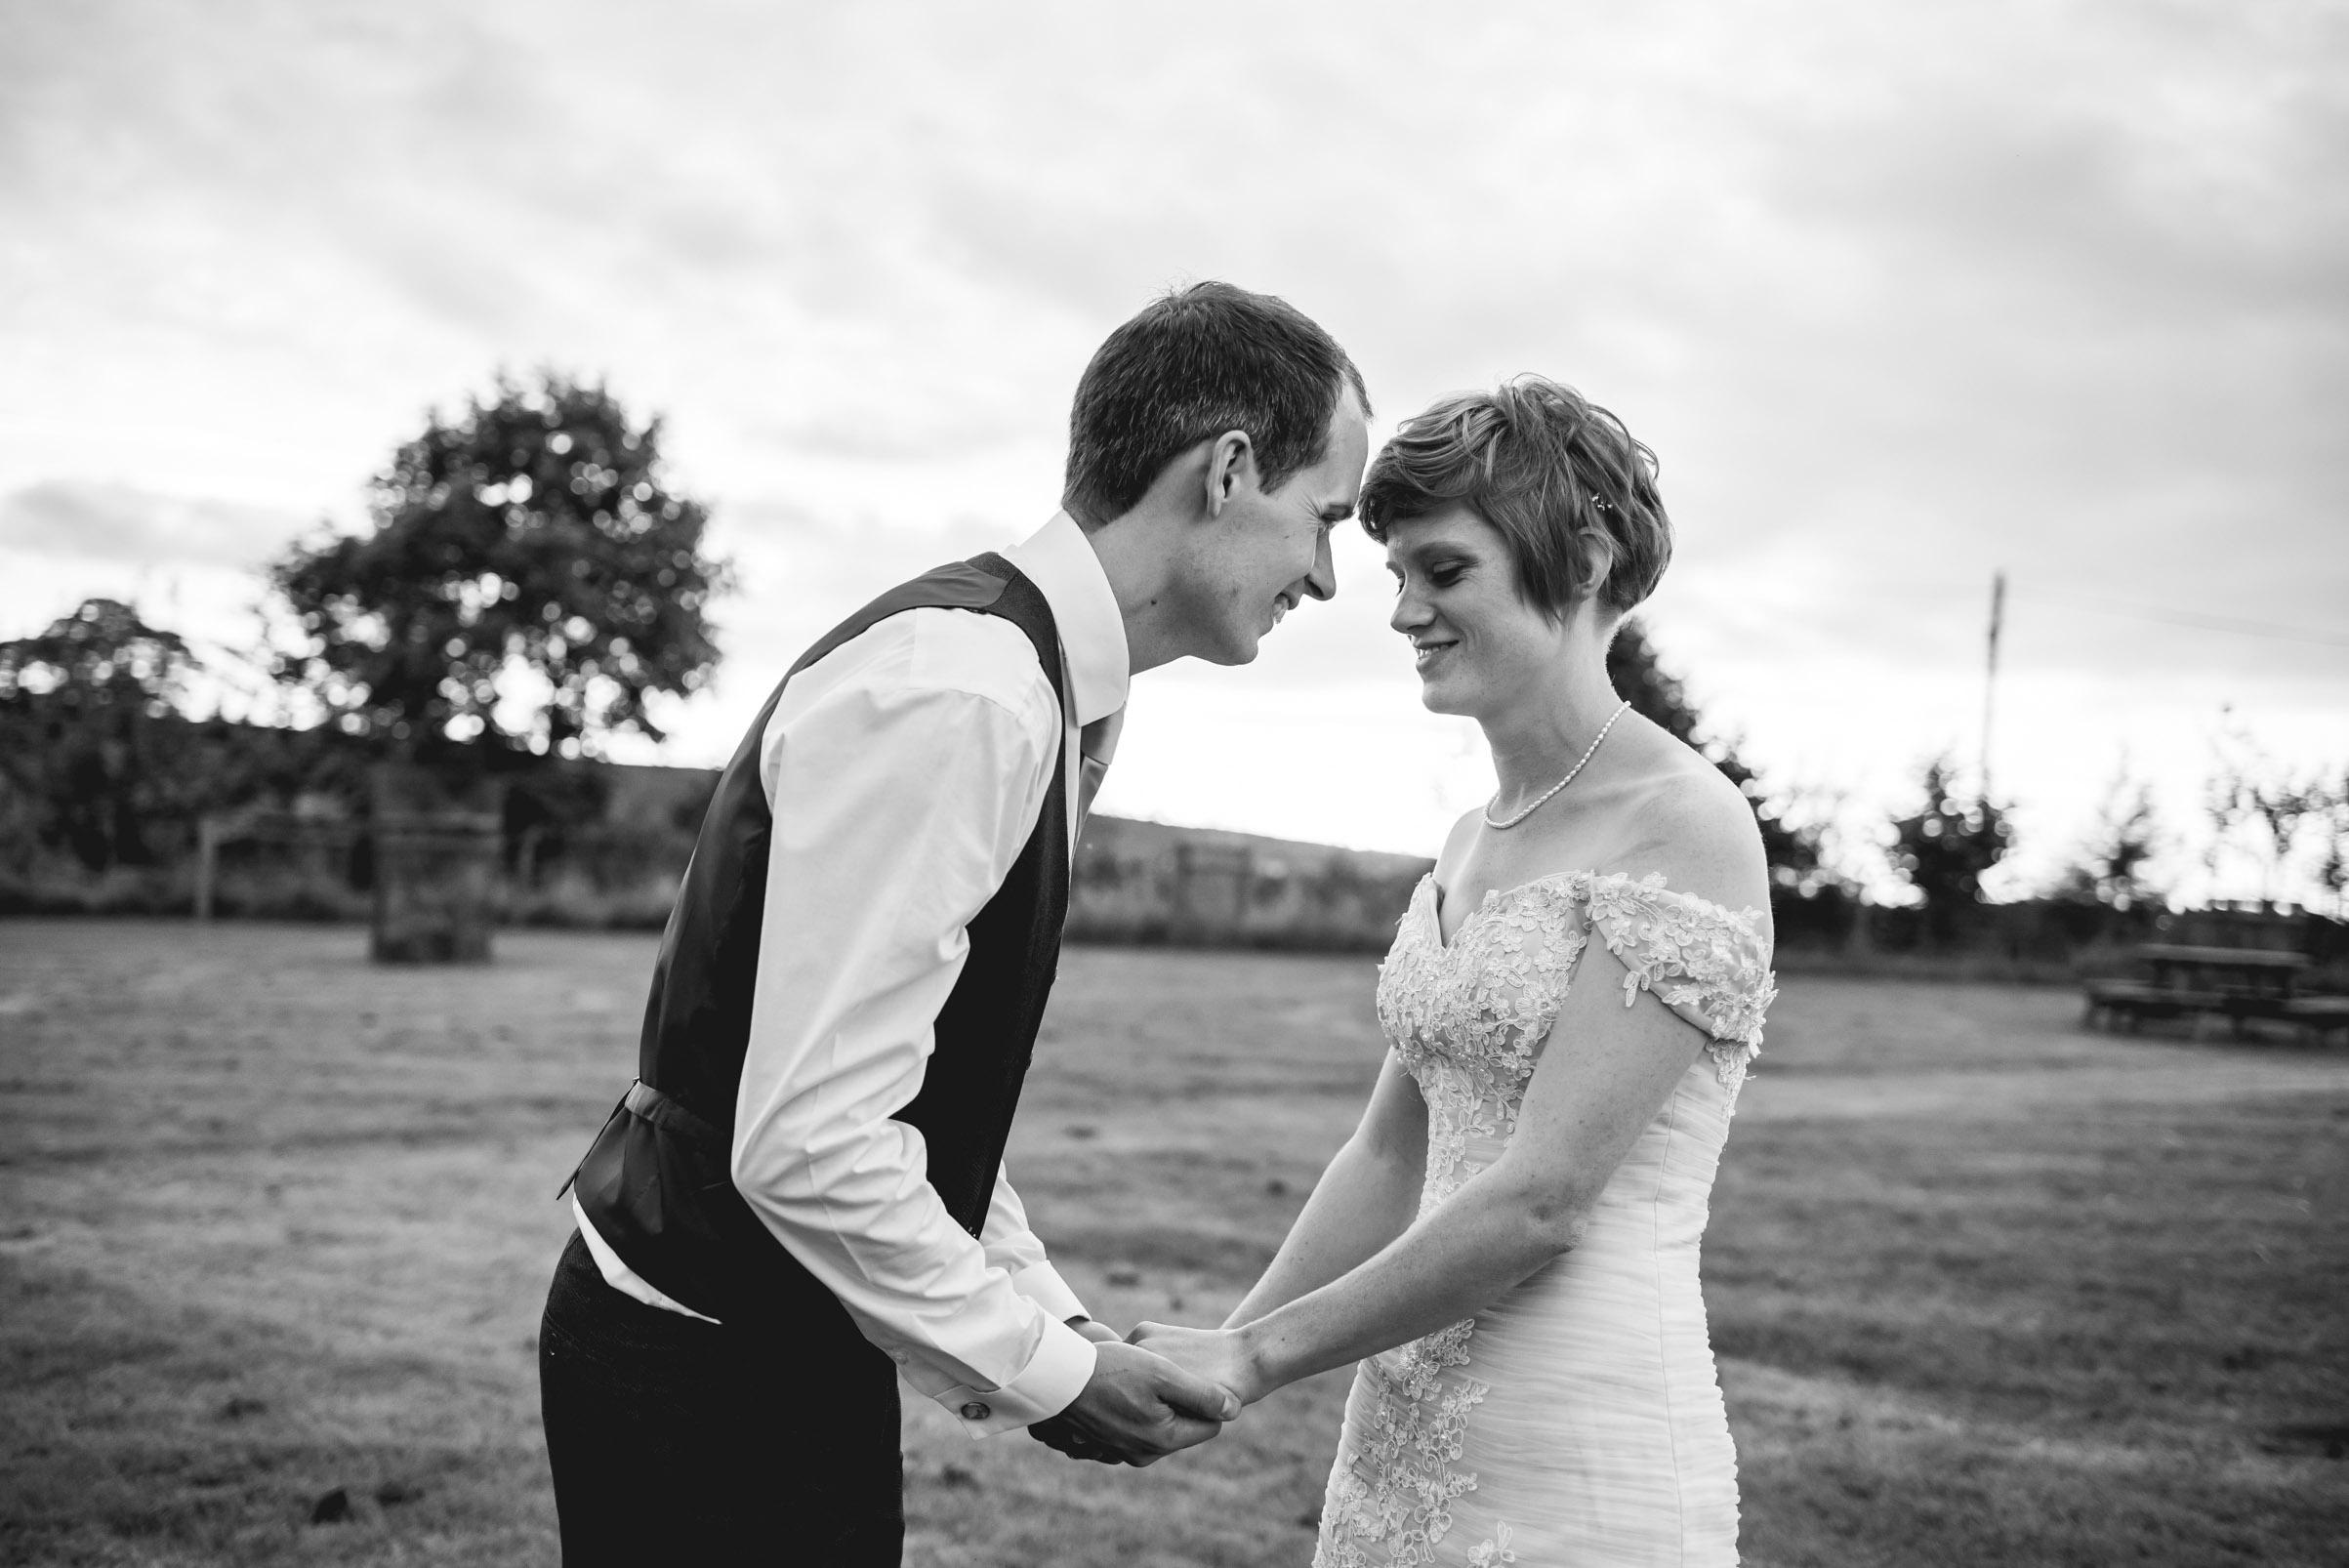 Peak+district+farm+wedding+lower+damgate+photographer-201.jpg